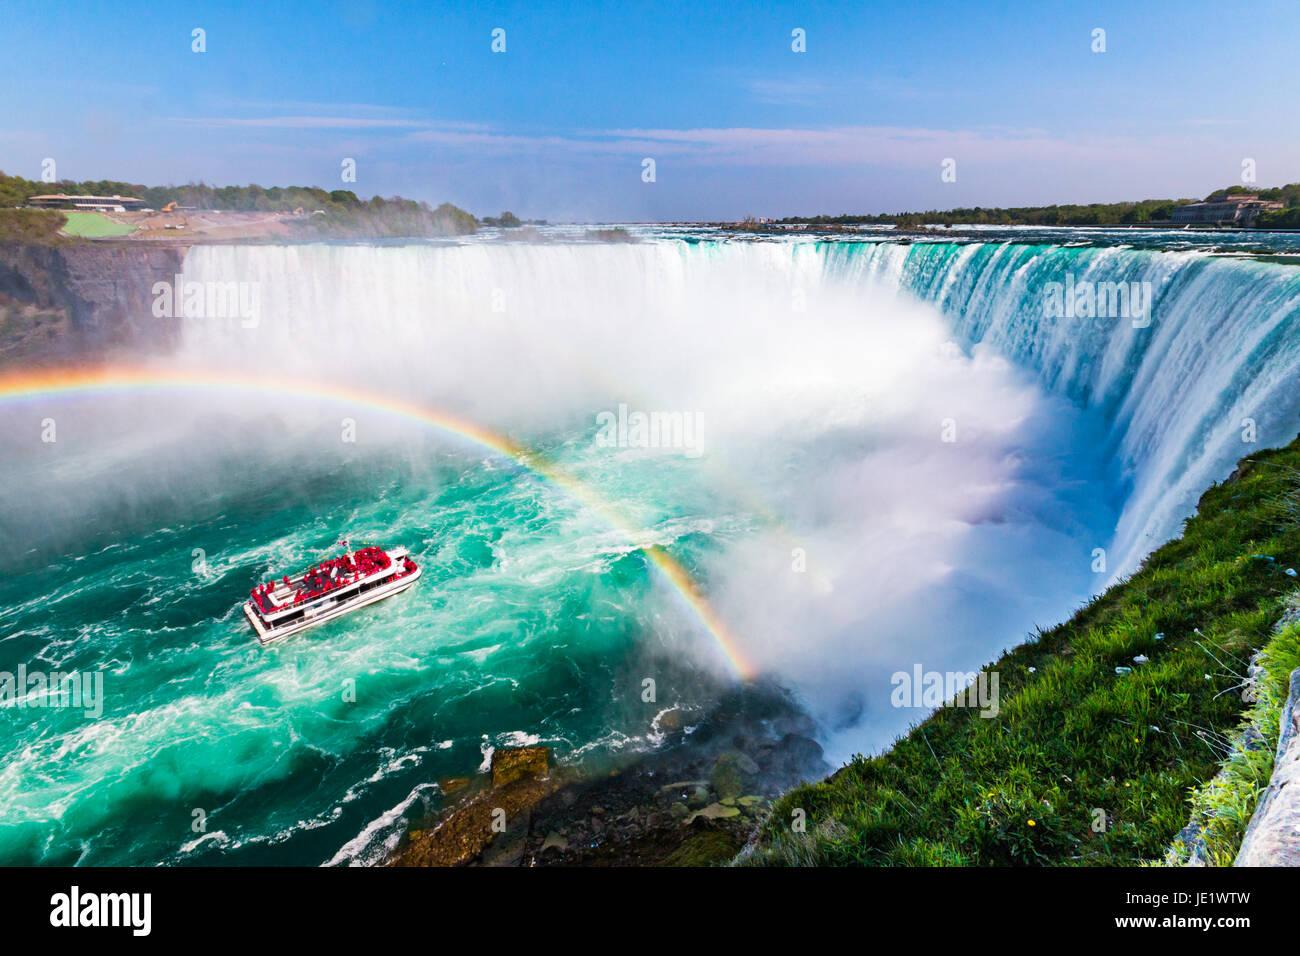 Hornblower Boot voller Touristen unter Rainbow besprüht von Hufeisen Wasserfall, Niagara Falls, Ontario, Kanada Stockbild